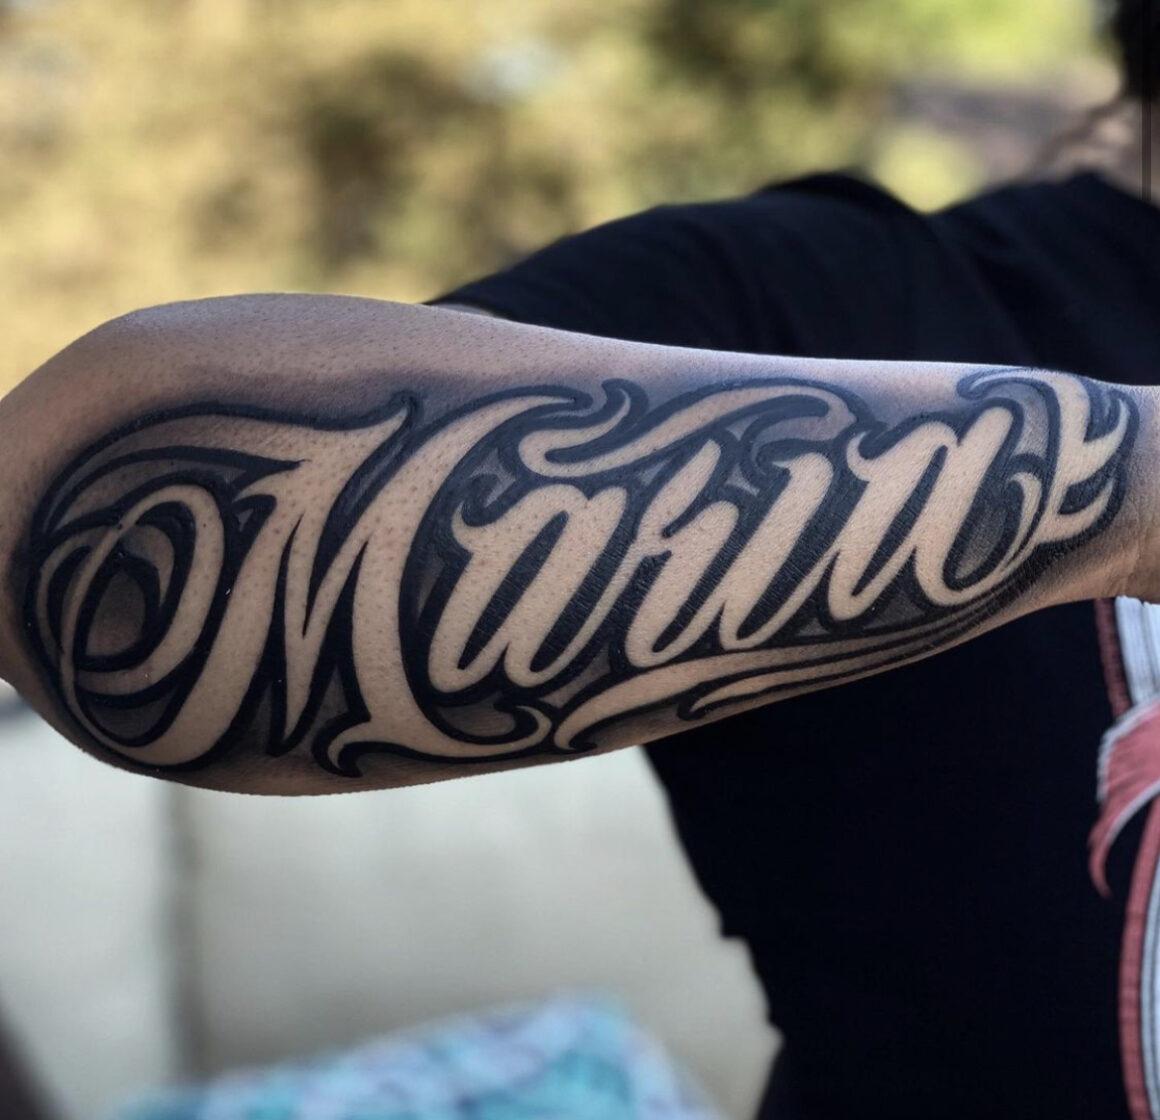 Joey, Merced Tattoo, Merced, USA